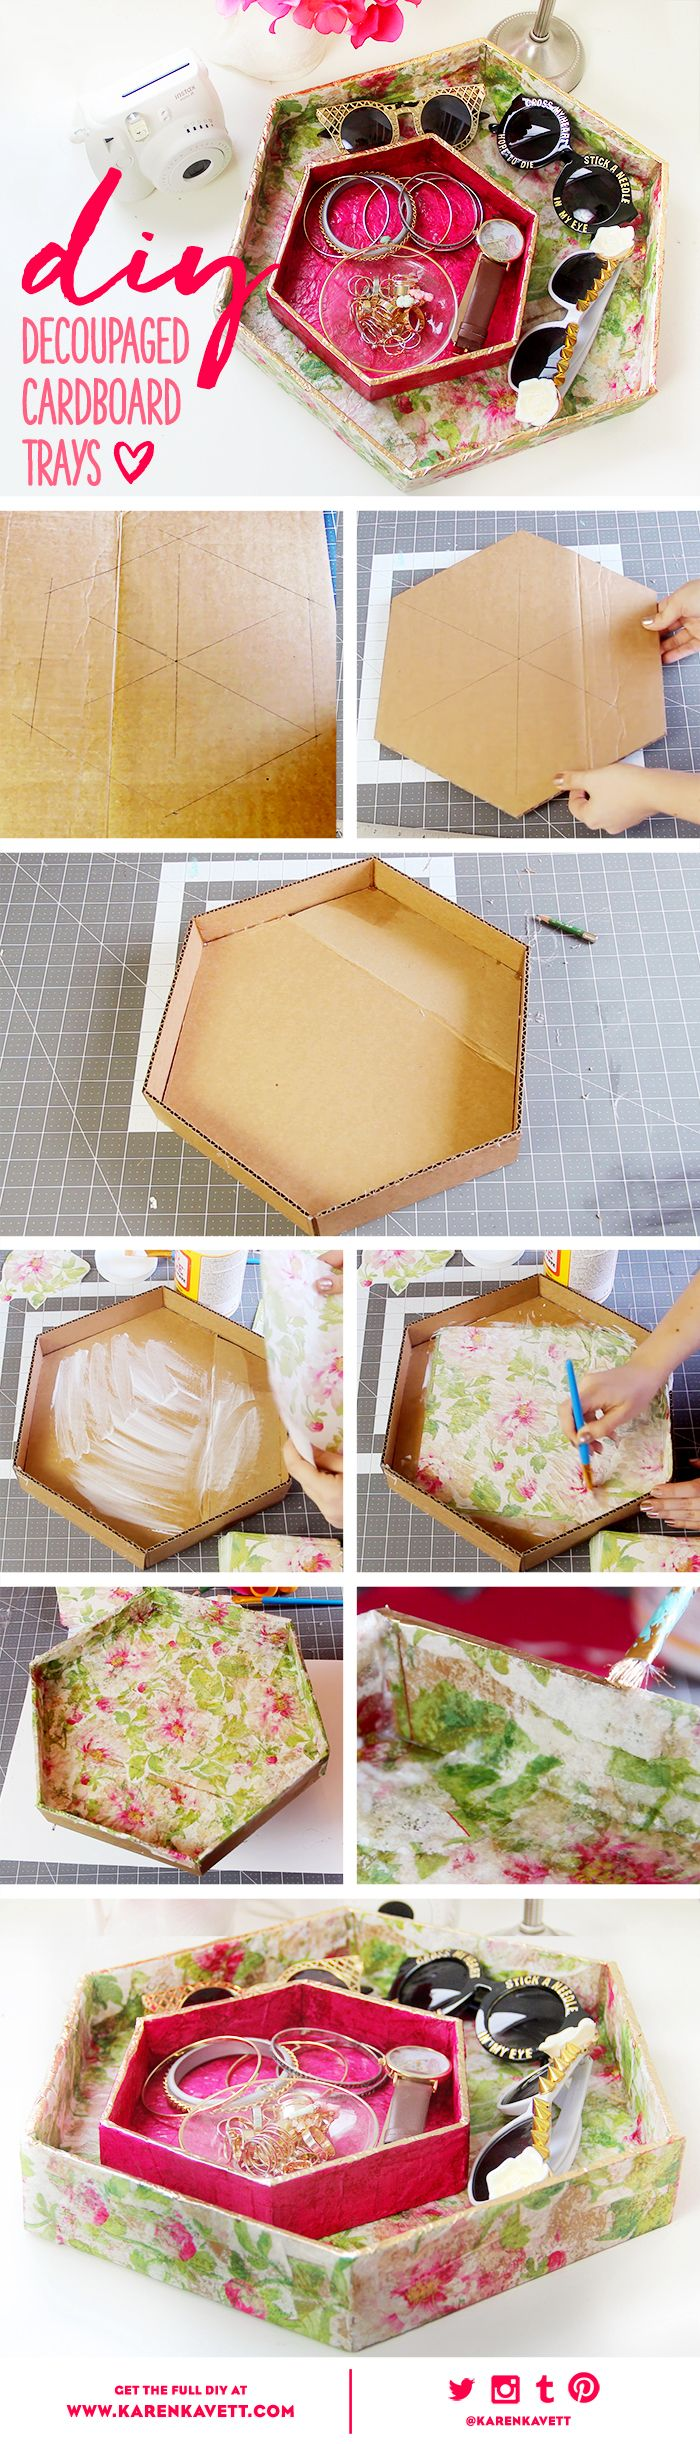 DIY Decoupage Cardboard Trays | Karen Kavett